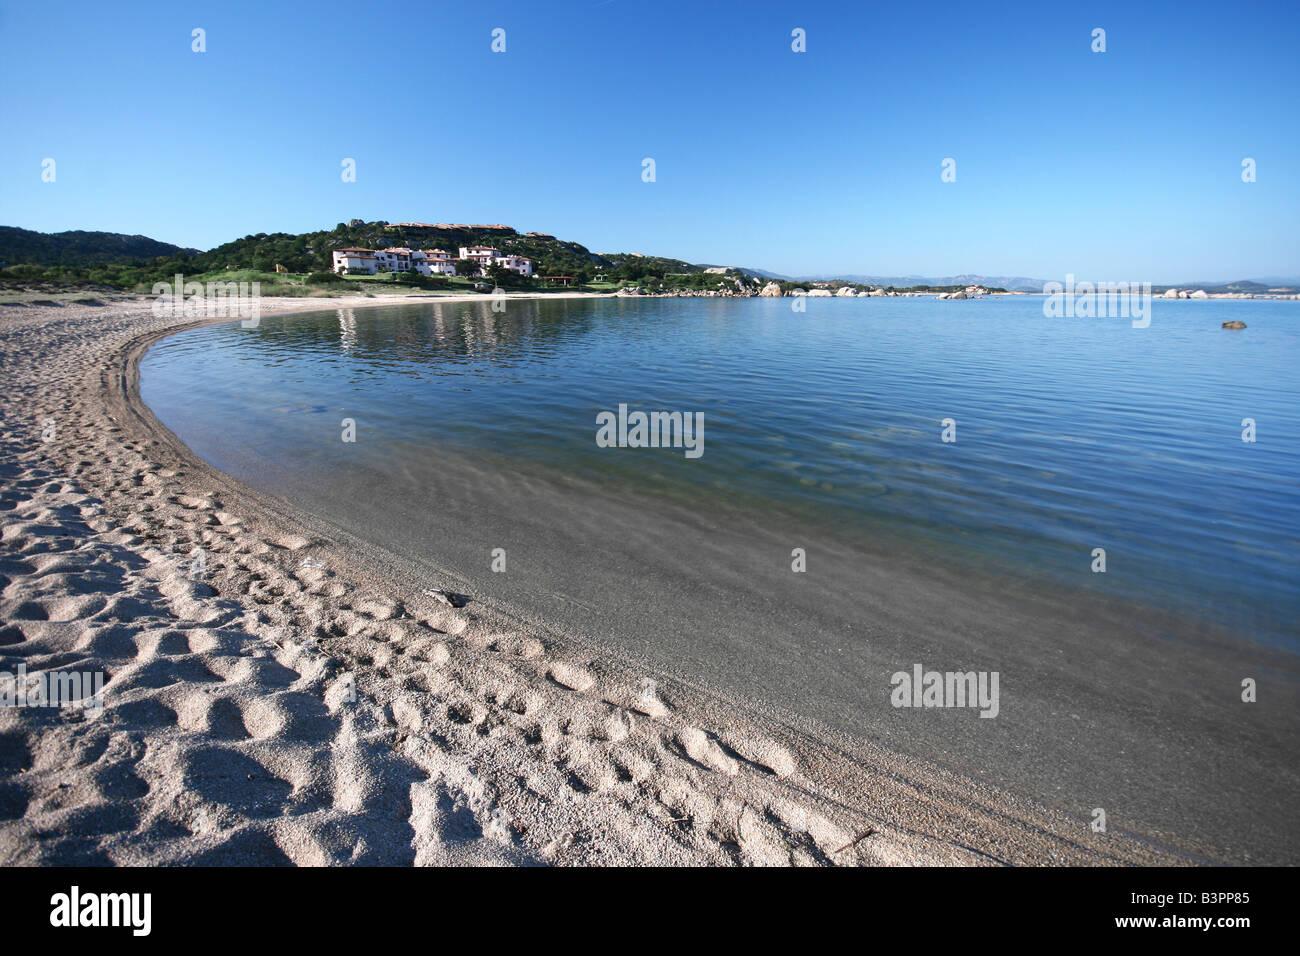 Li Cuncheddi beach,  Cala Sa Figu, Olbia, Sardinia, Italy - Stock Image